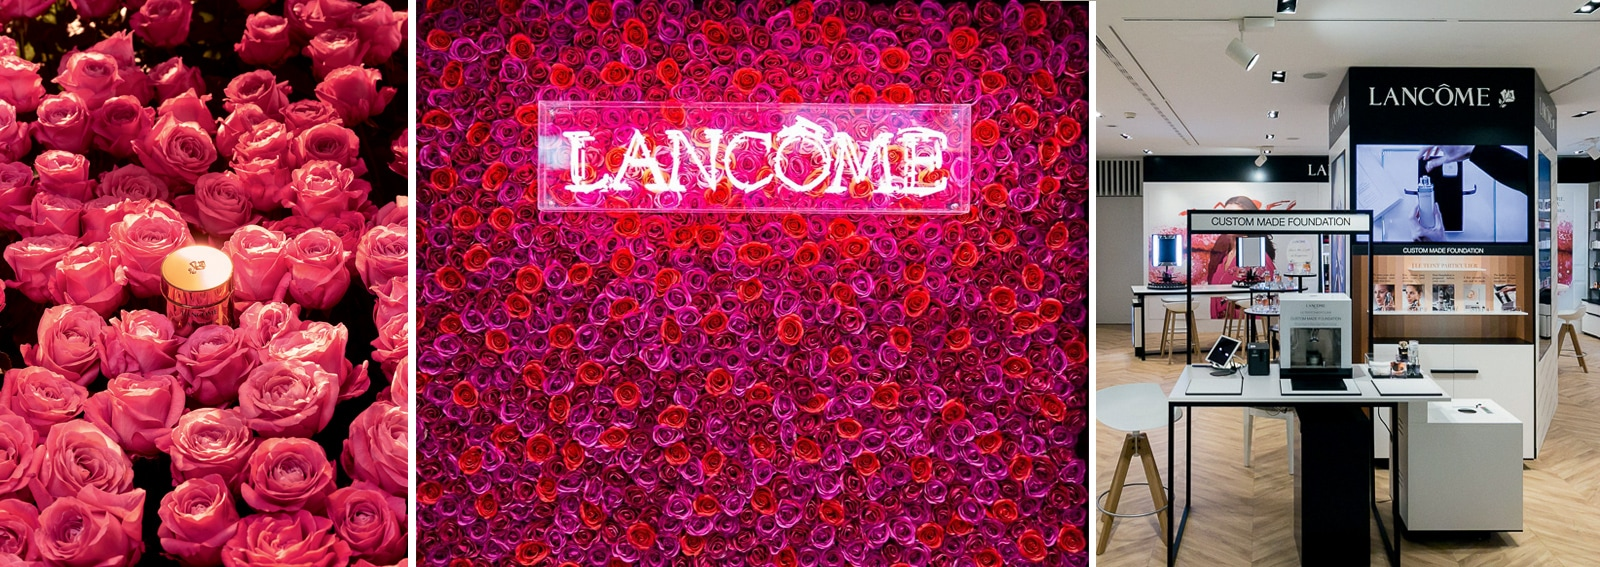 1600x567-lancome